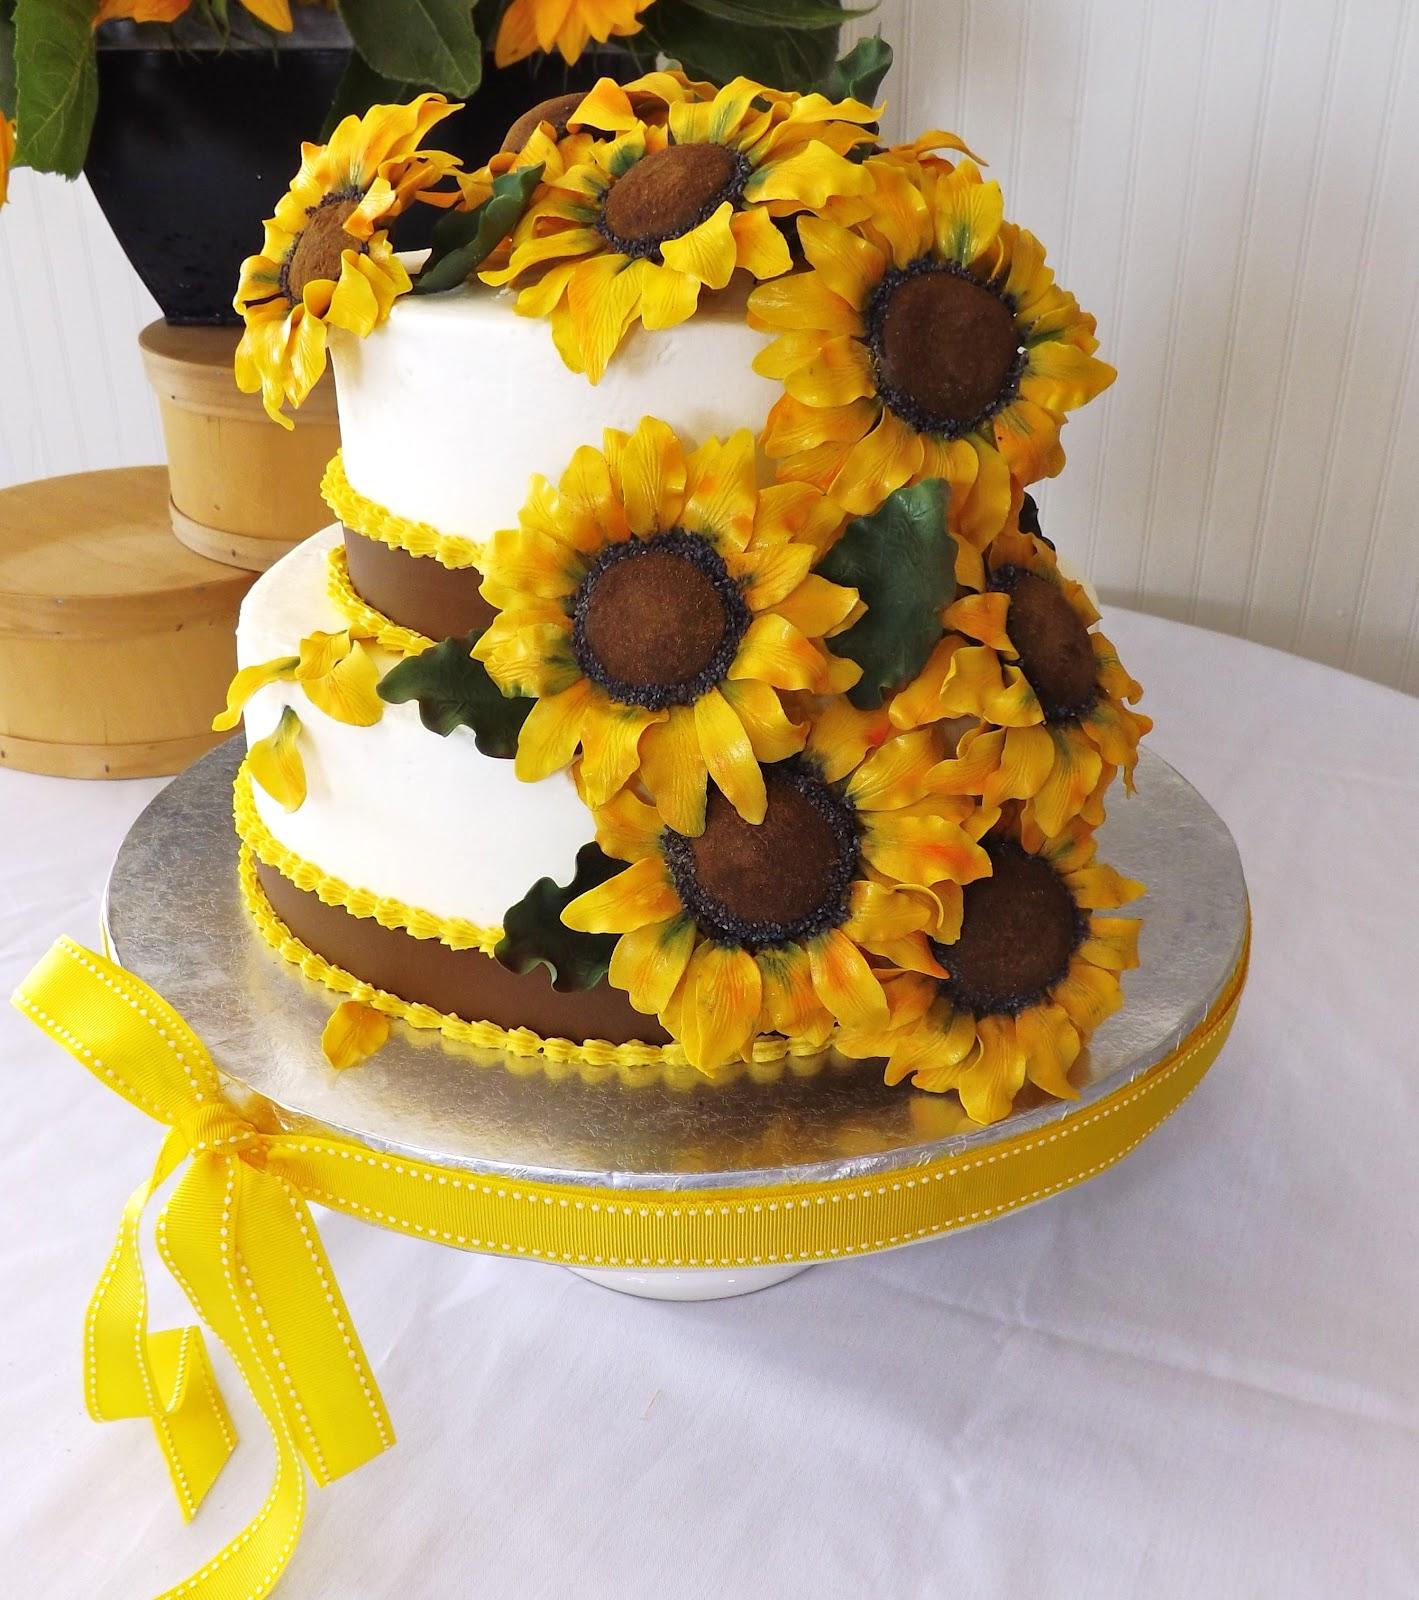 Stupendous 10 Birthday Cakes With Sunflowers Photo Sunflower Birthday Cake Funny Birthday Cards Online Necthendildamsfinfo